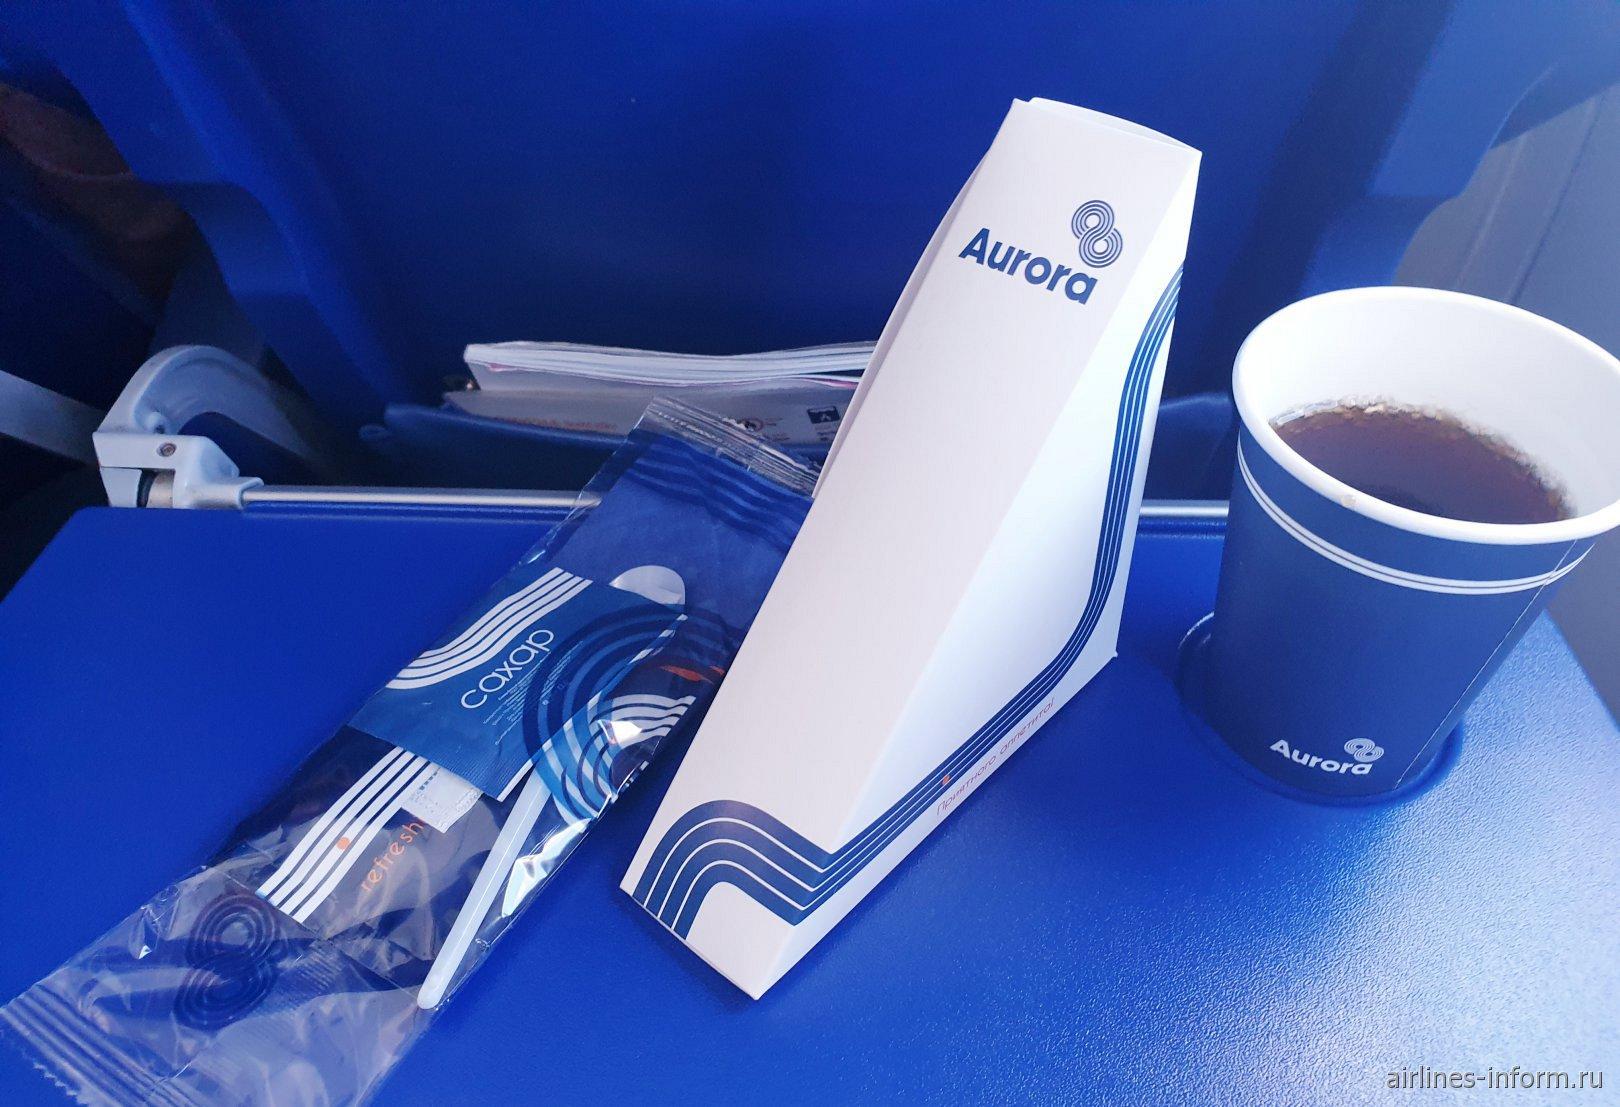 Бортпитание на рейсе Южно-Сахалинск-Хабаровск авиакомпании